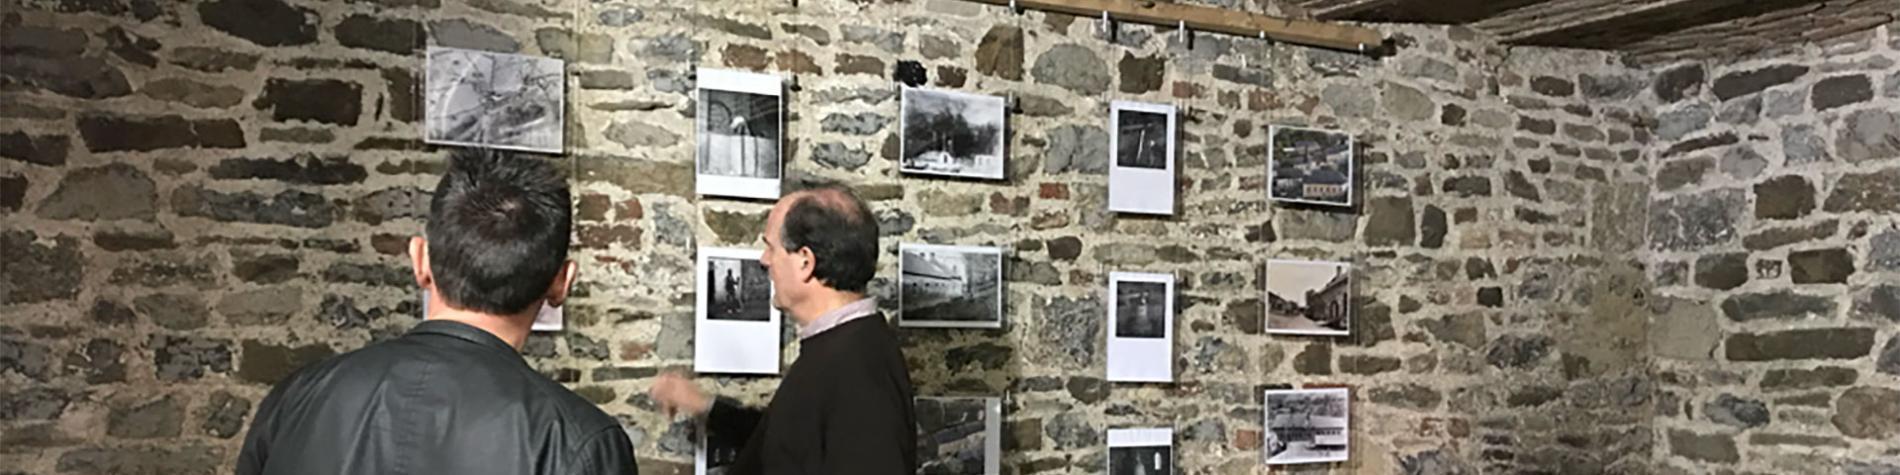 Ancienne fonderie - cloches - Tellin - patrimoine campanaire - cire perdue - exposition photos